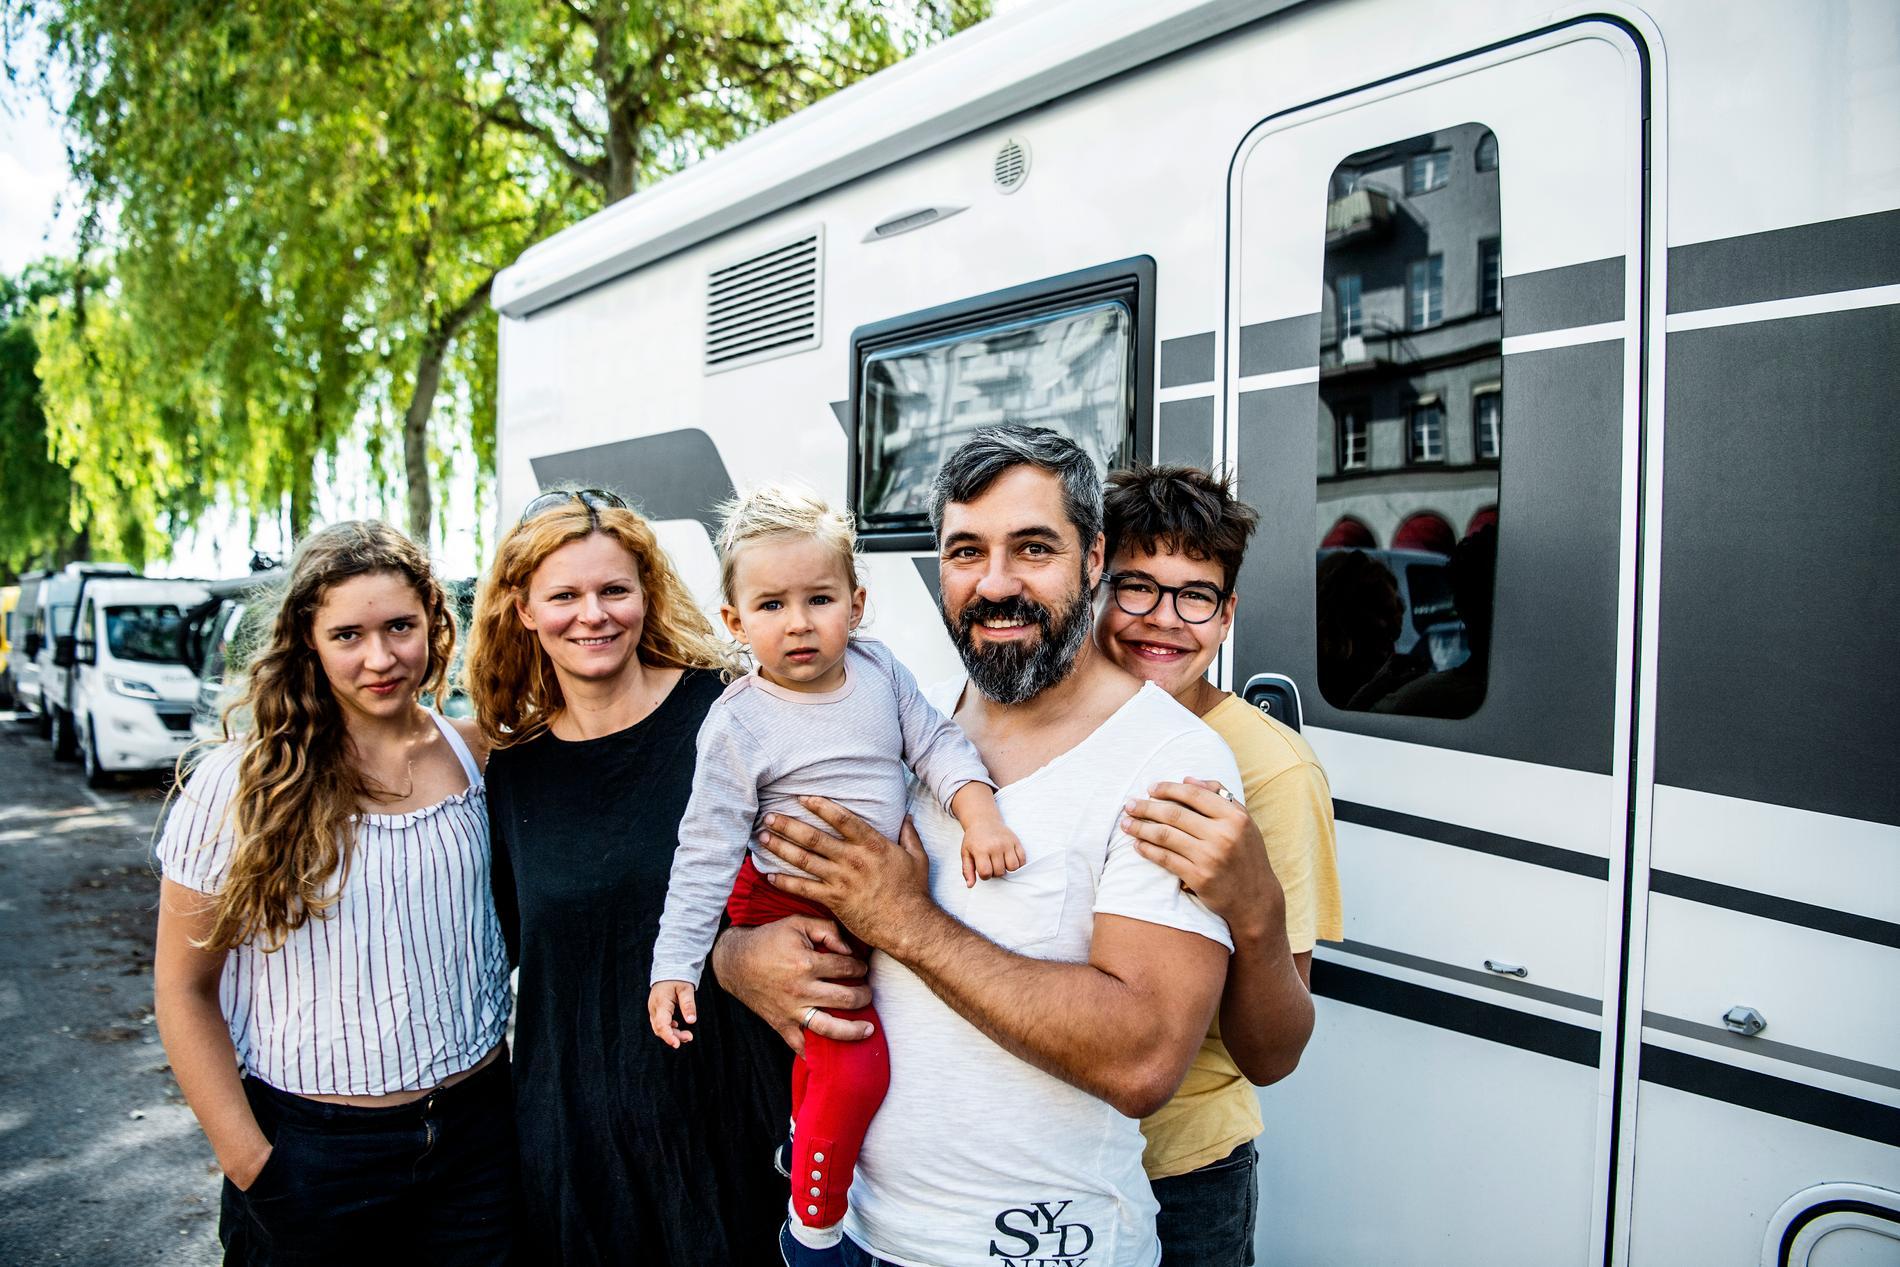 Alexander Schwandt, Freidrike Schwandt, Adele Schwandt, Justus Schwandt och Emilia Schwandt är turister från Tyskland.